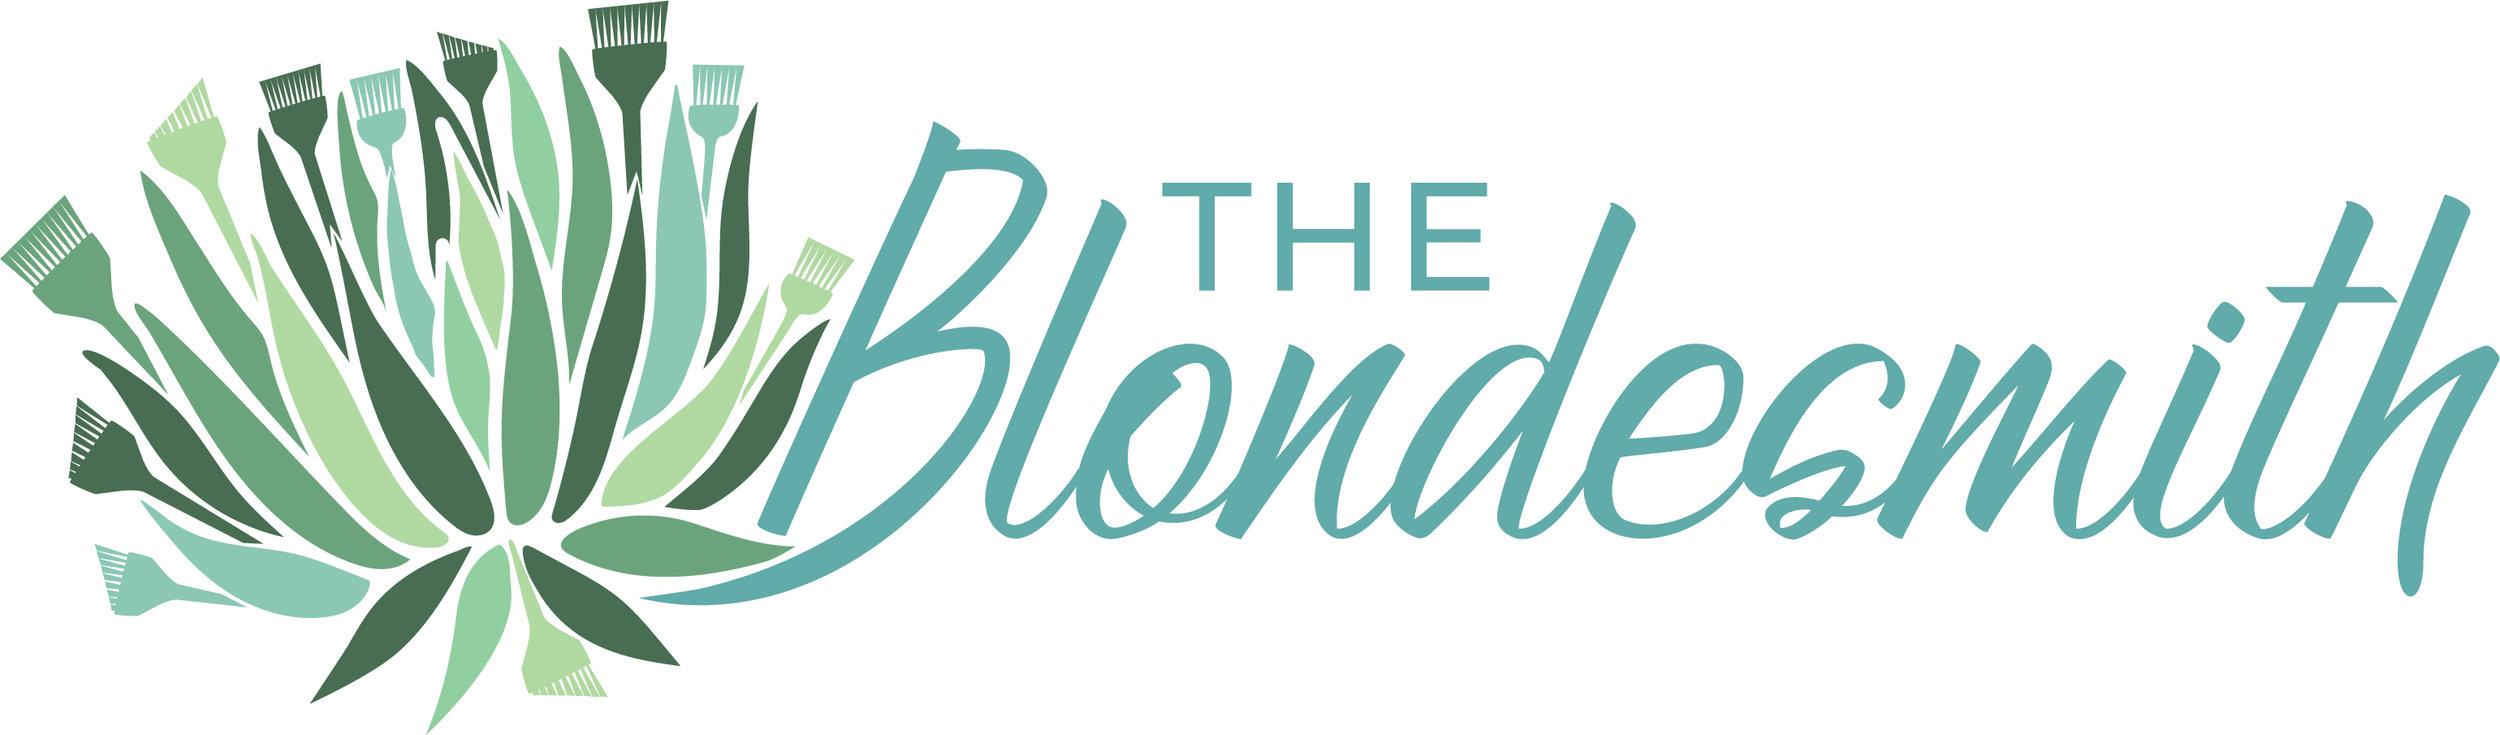 Blondesmith_Logo_091118.jpg